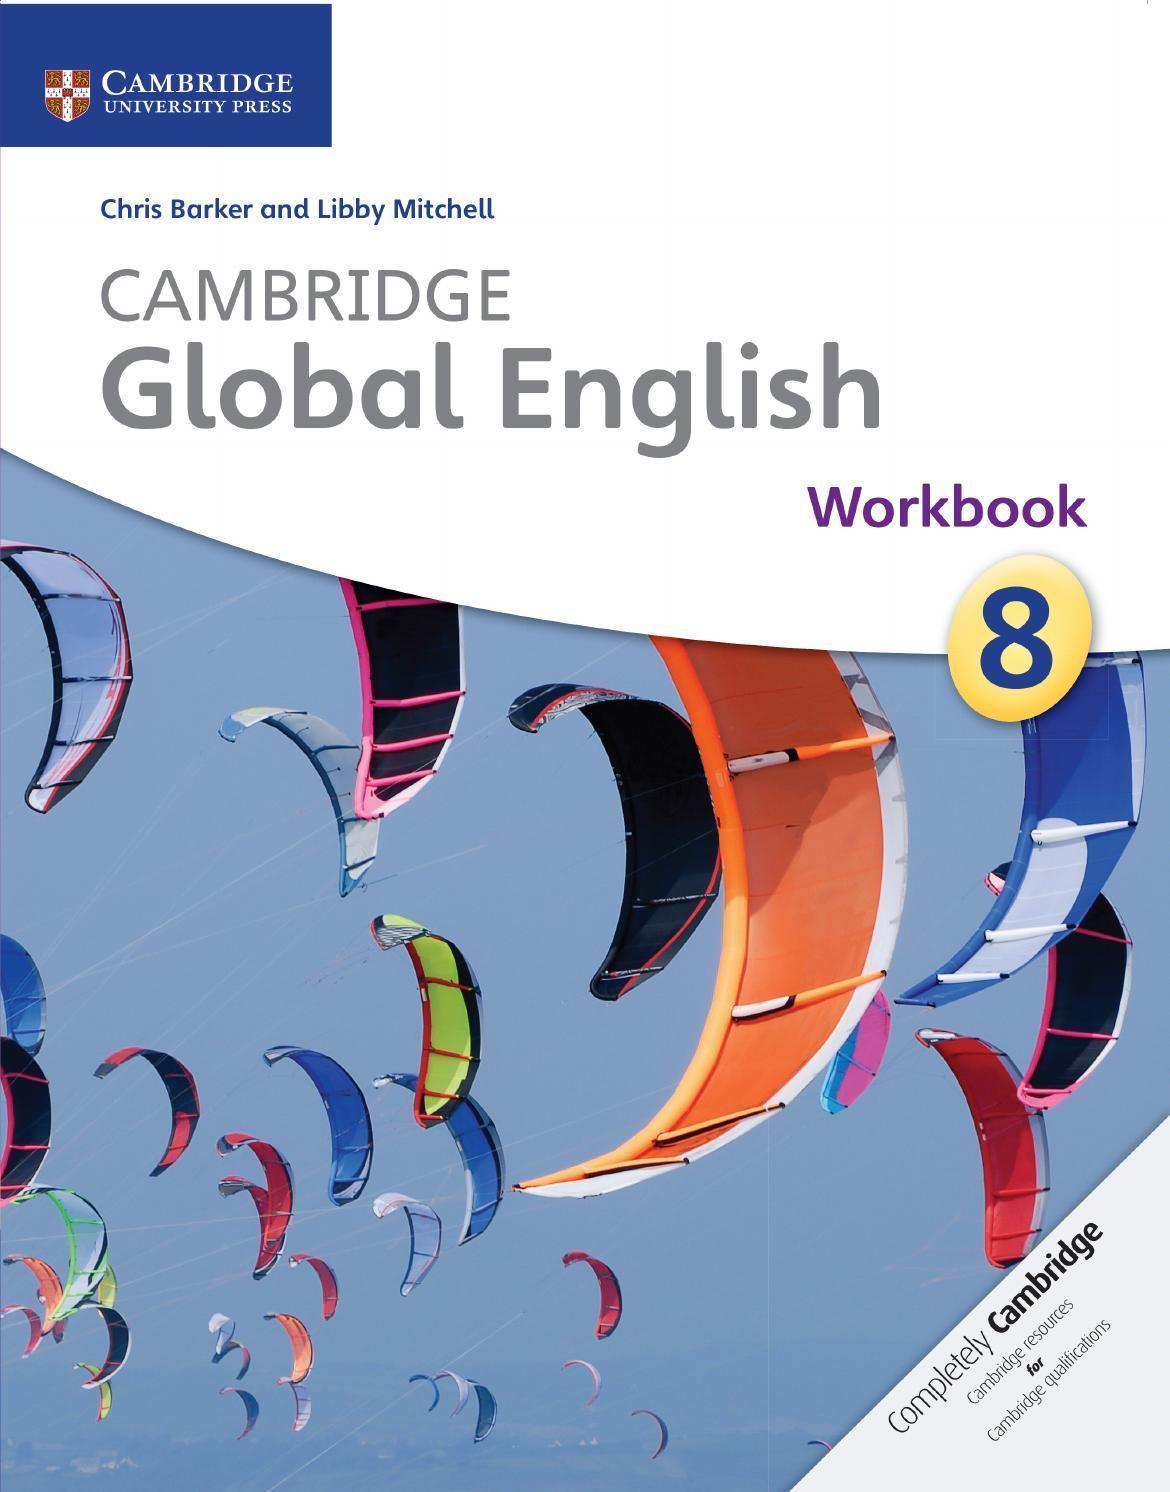 Preview cambridge global english workbook 8 cambridge university preview cambridge global english workbook 8 fandeluxe Image collections